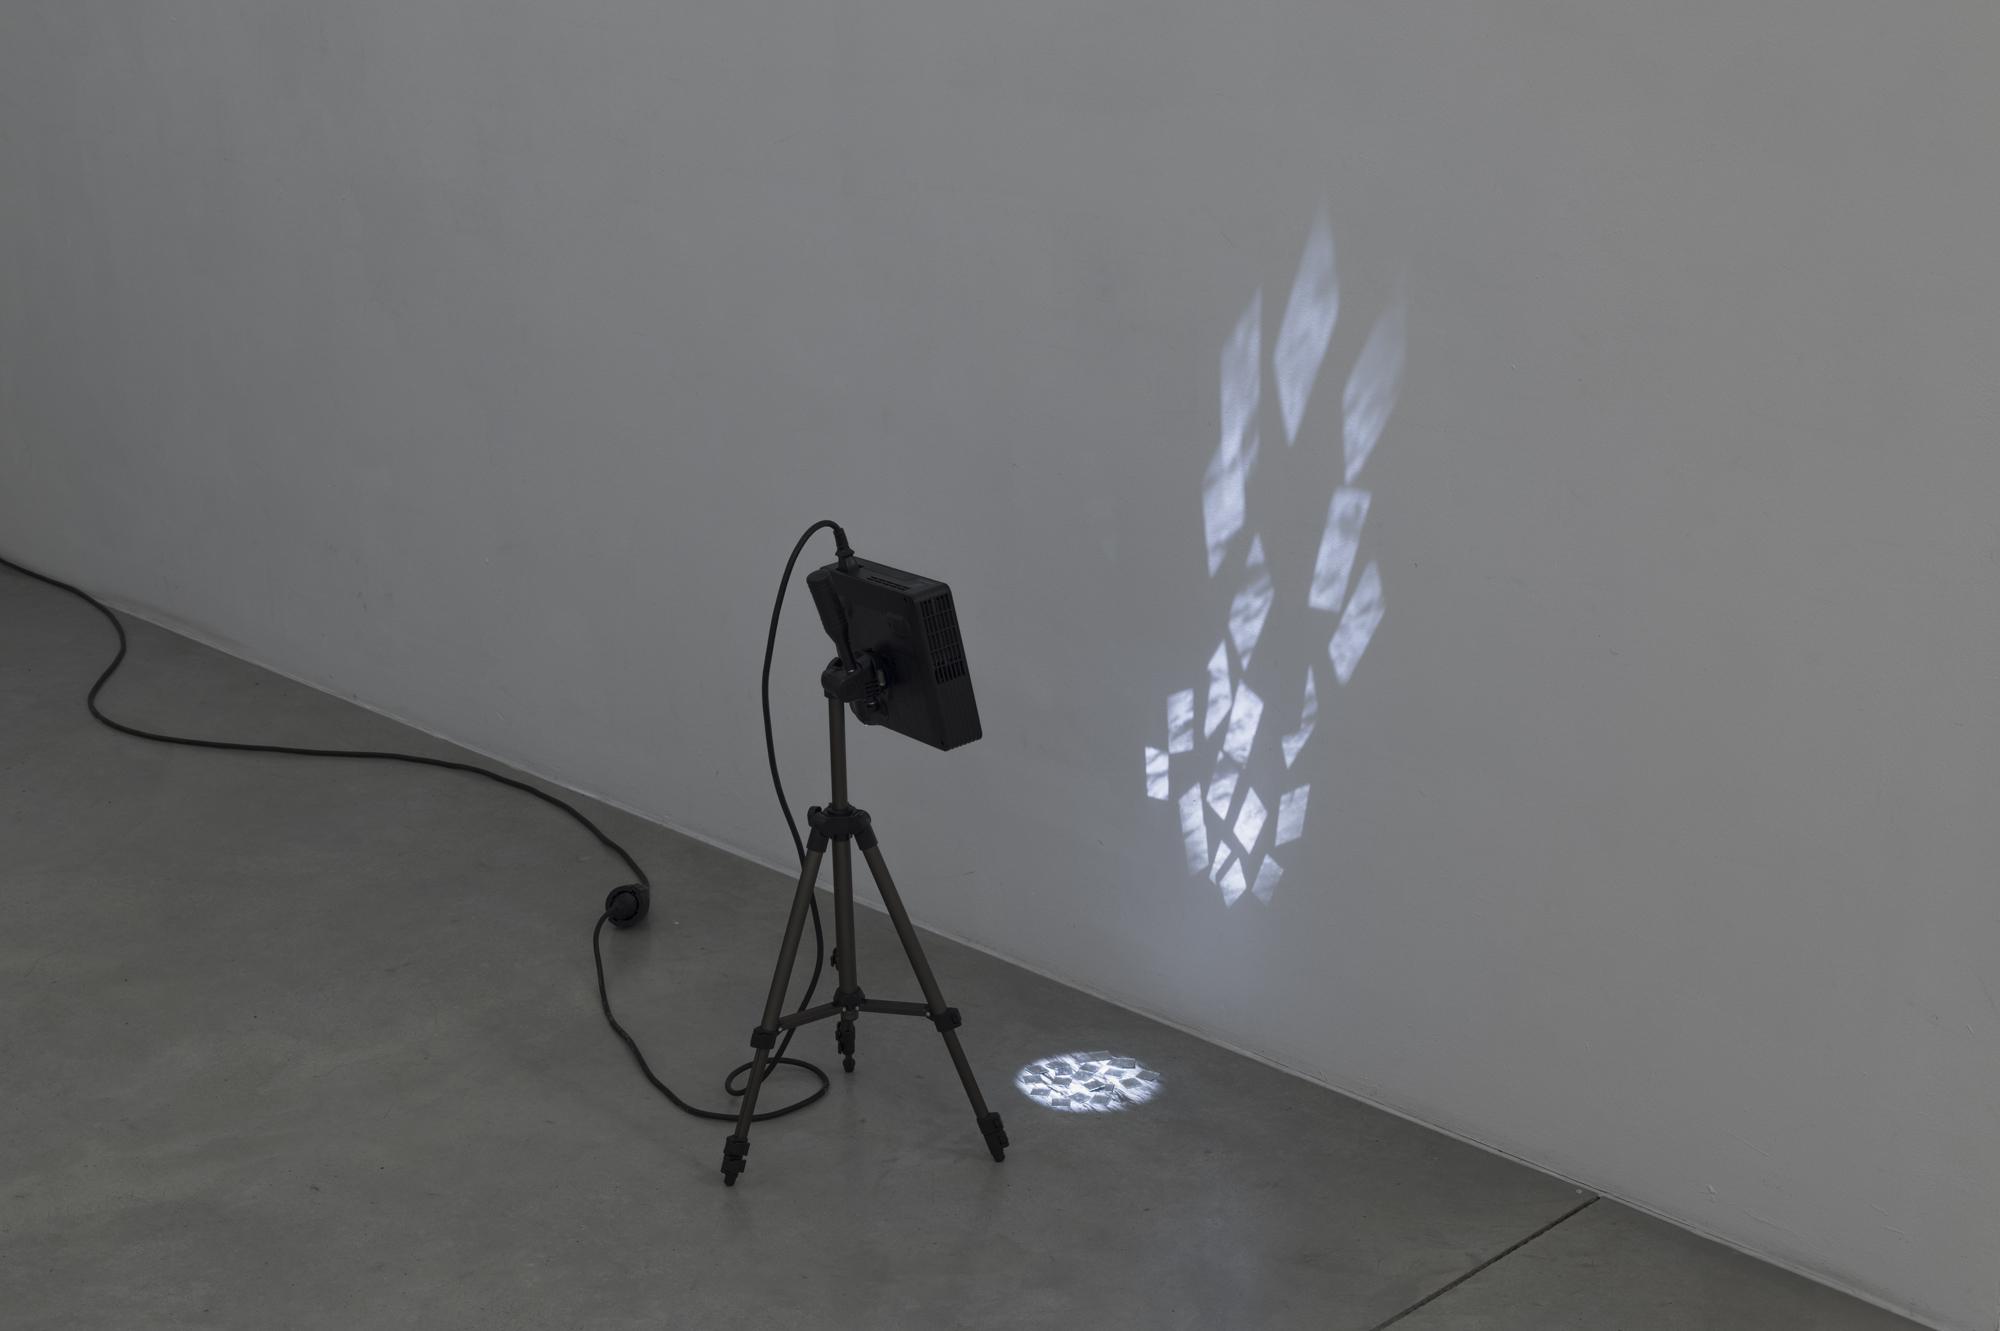 Vadim FISHKIN, Treasure Island, 2017, mirrors, projector, tripod, variable dimensions